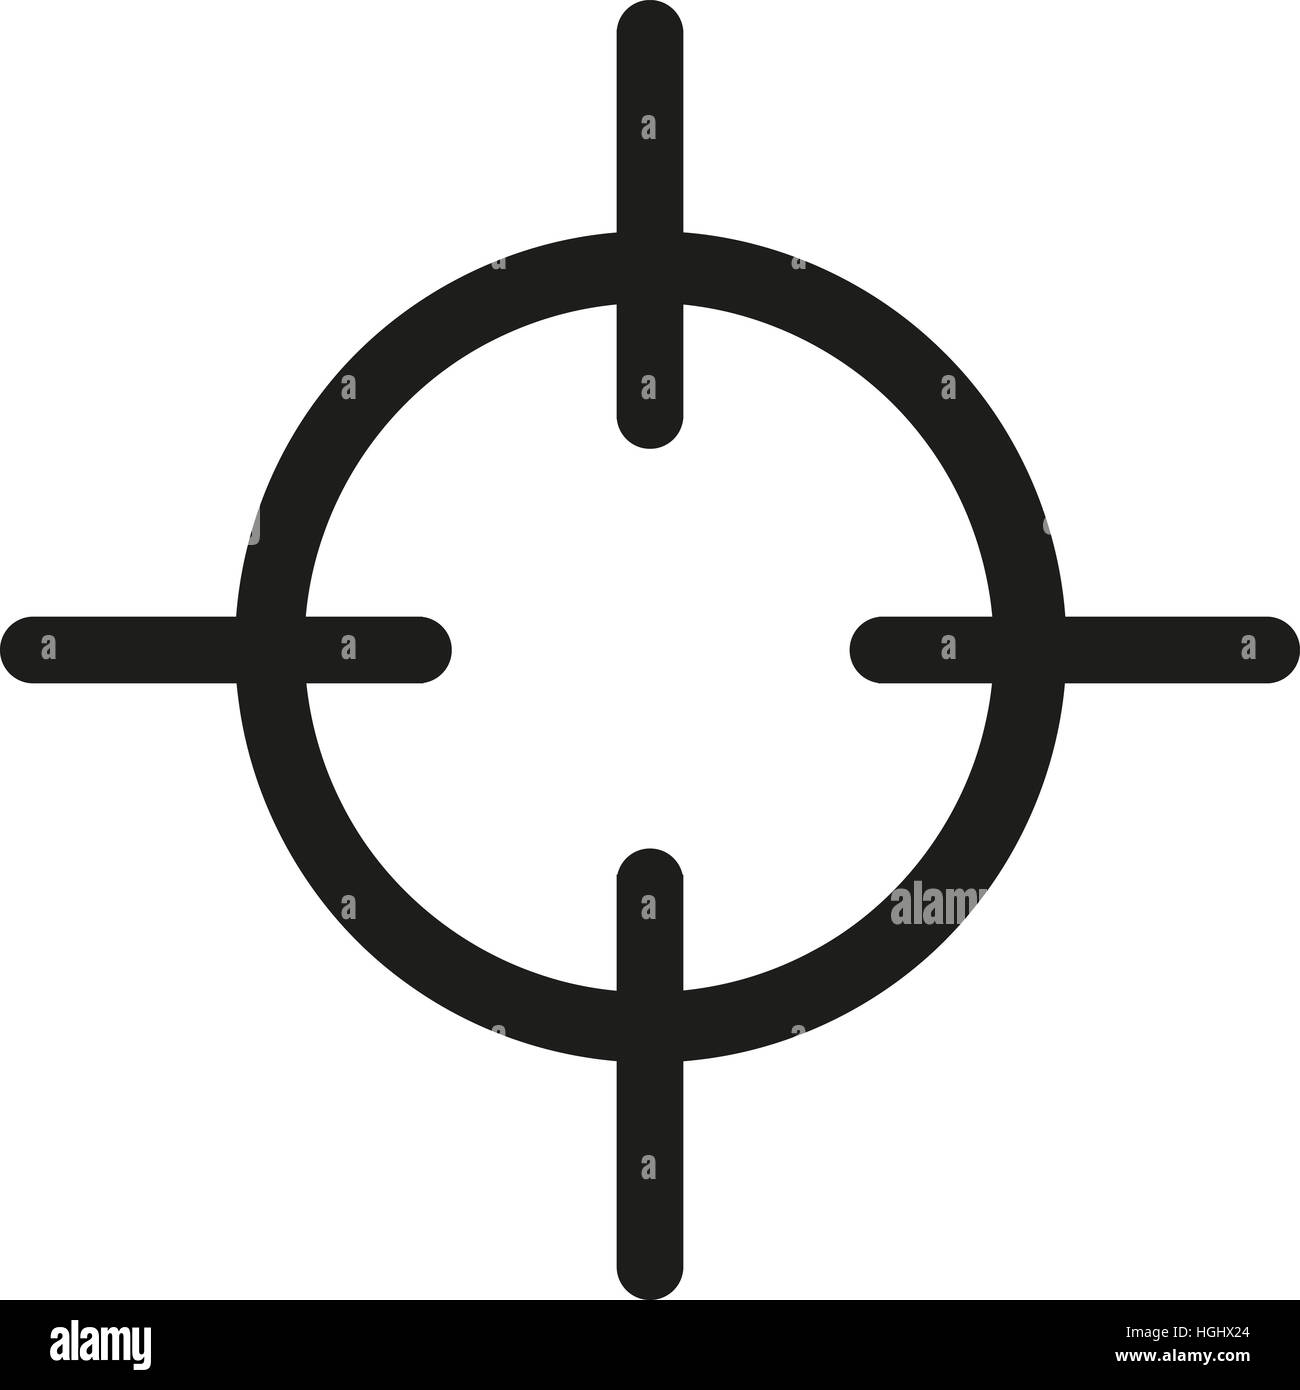 Crosshair target symbol stock photo 130700700 alamy crosshair target symbol buycottarizona Image collections